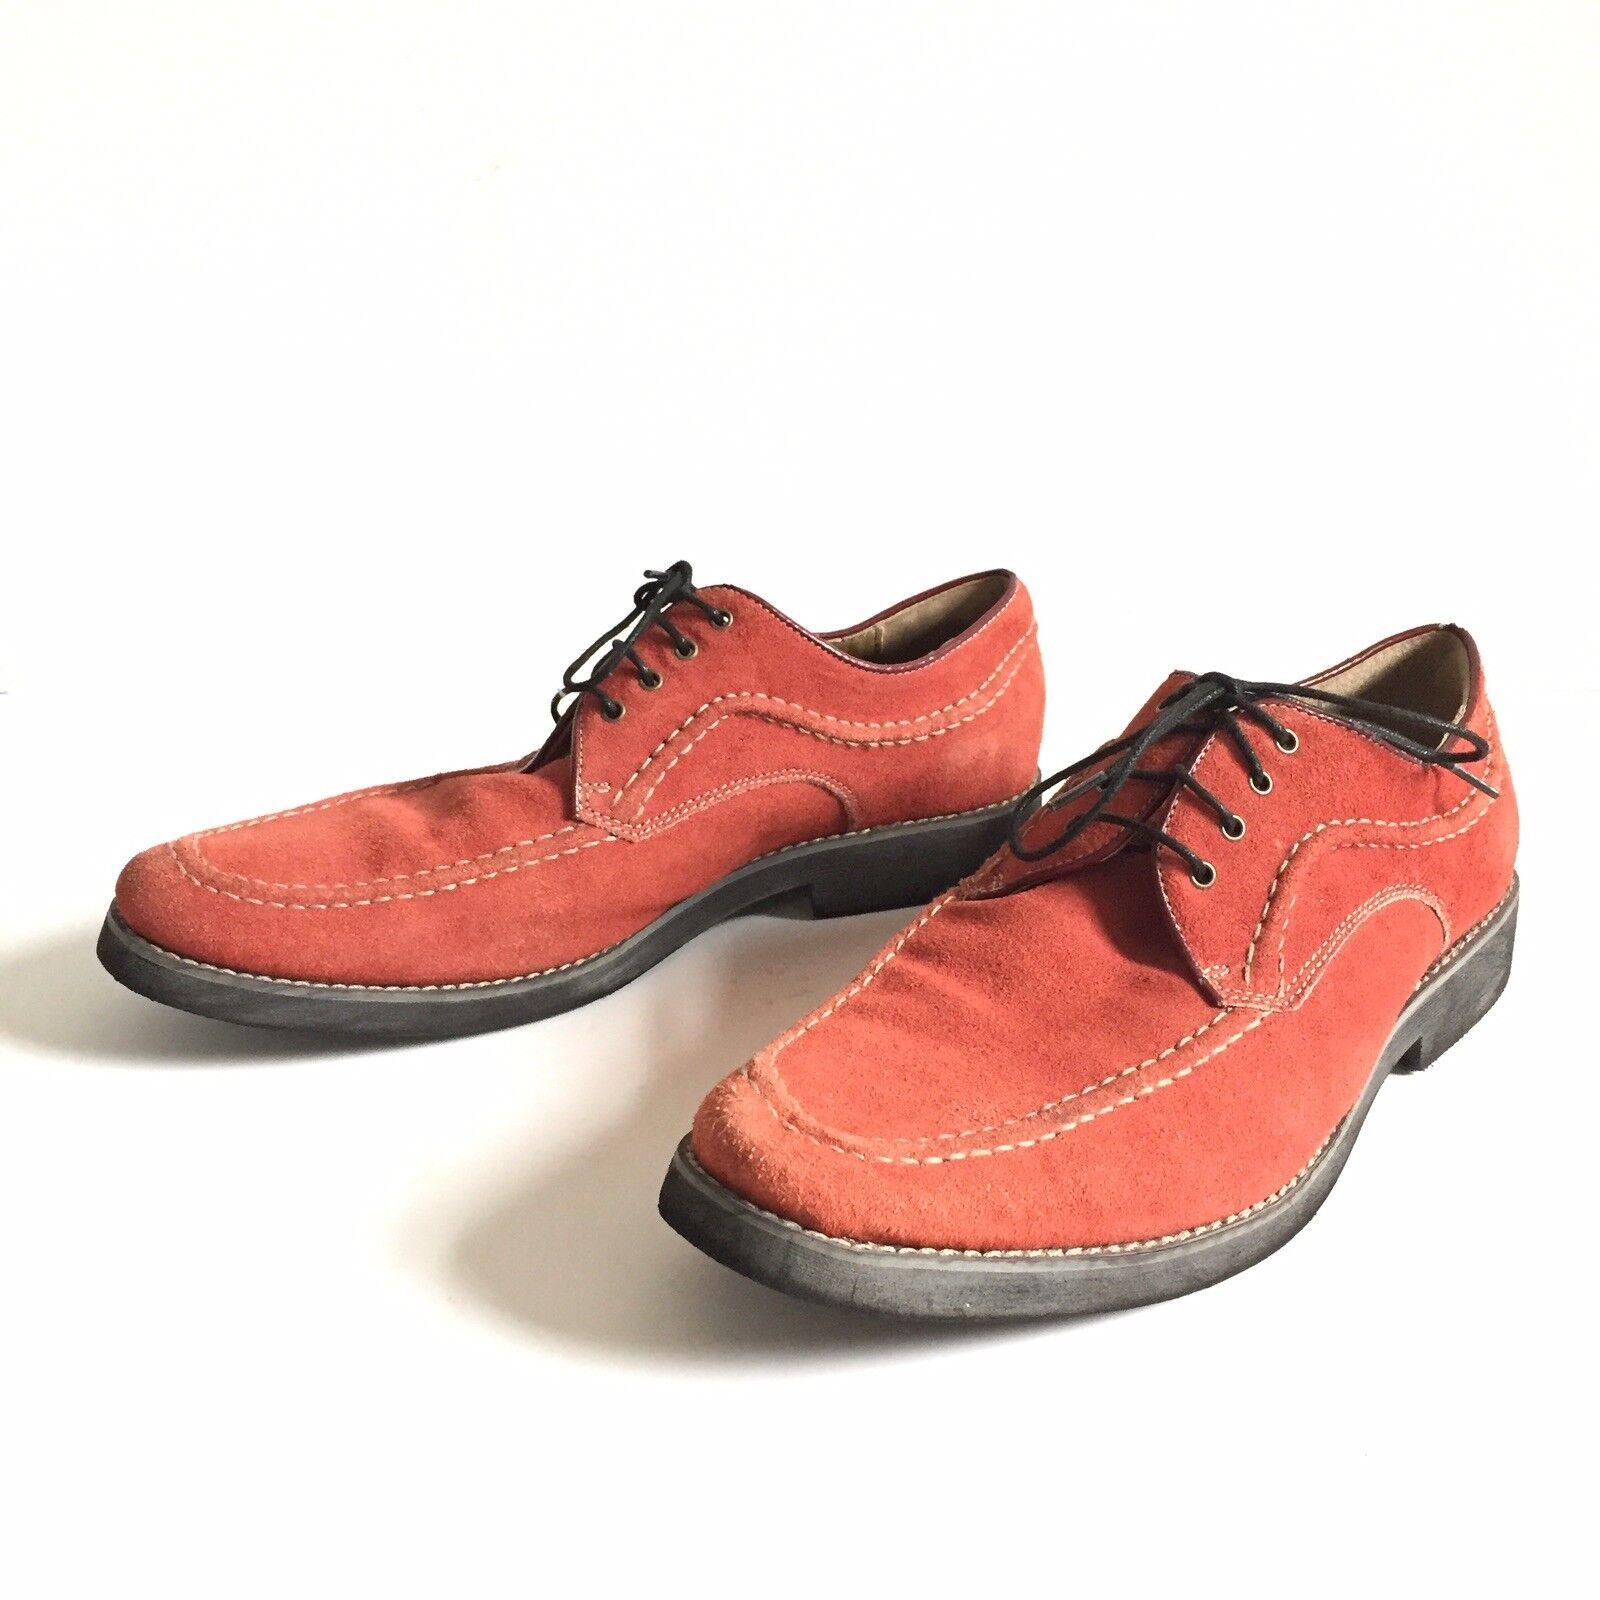 Купить Hush Puppies Oxford Suede Shoes